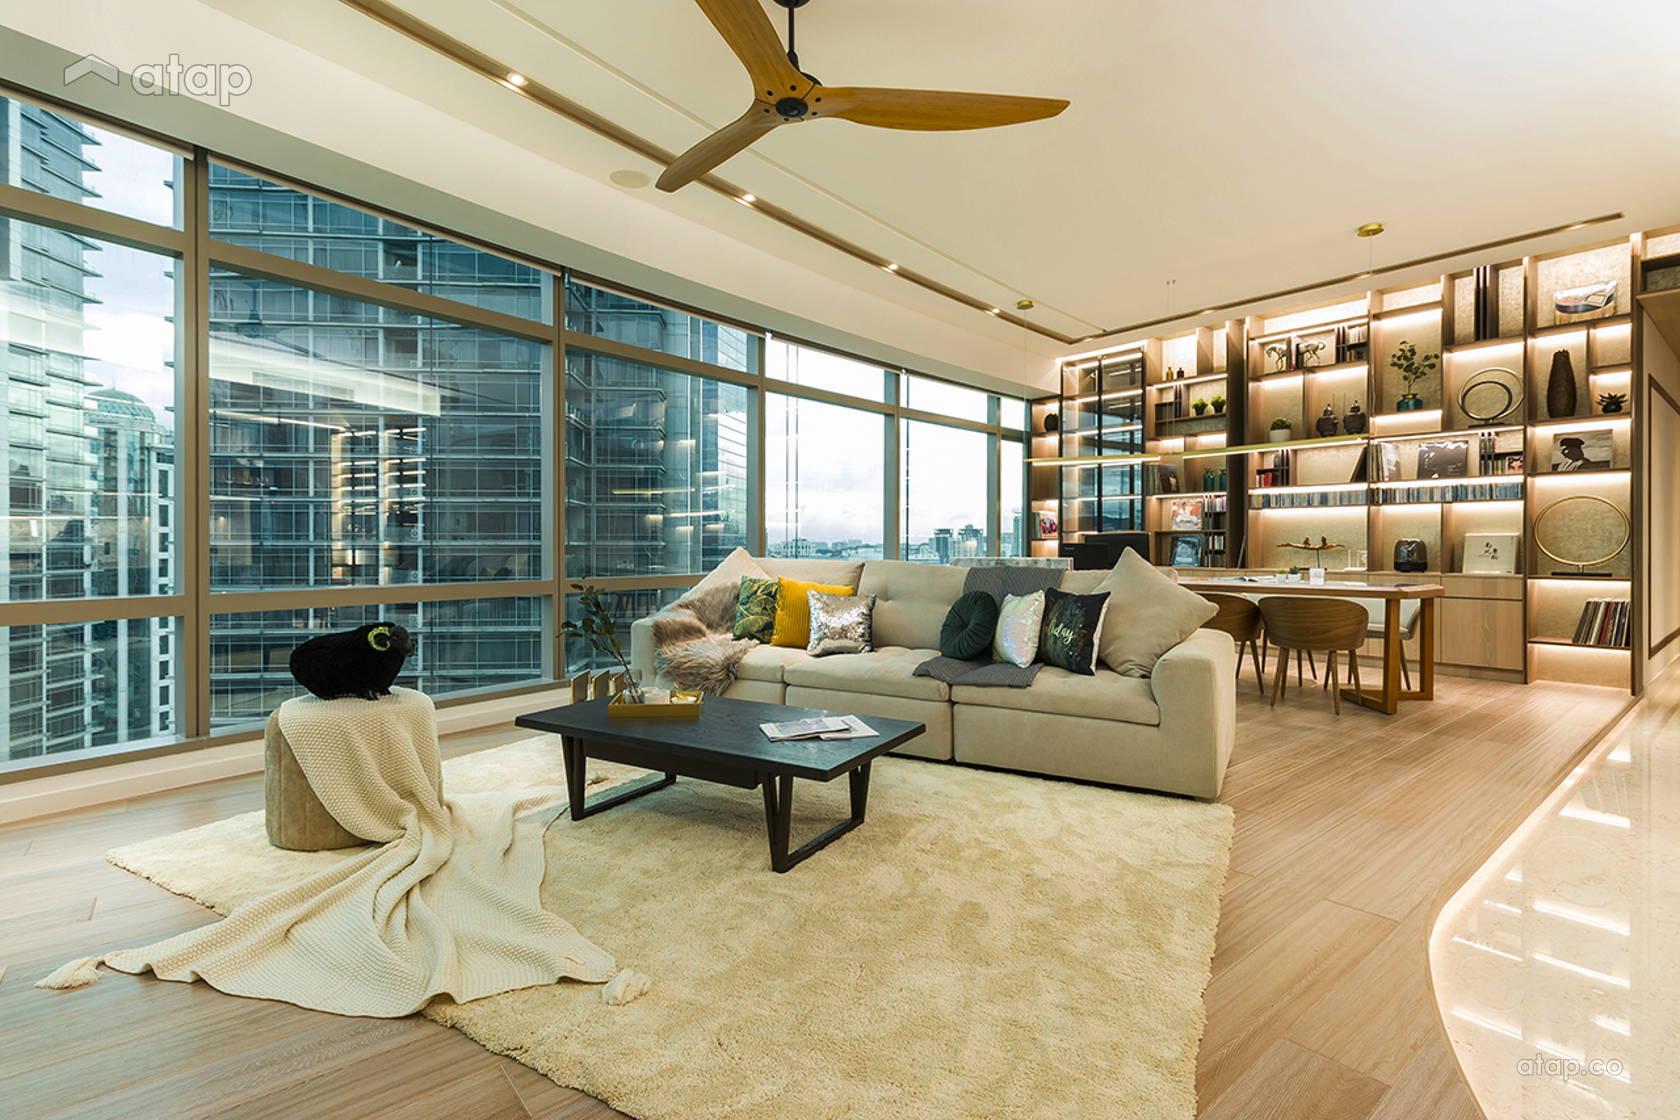 Industrial Scandinavian Dining Room Family Room @ Urban Luxury Sleek Contemporary